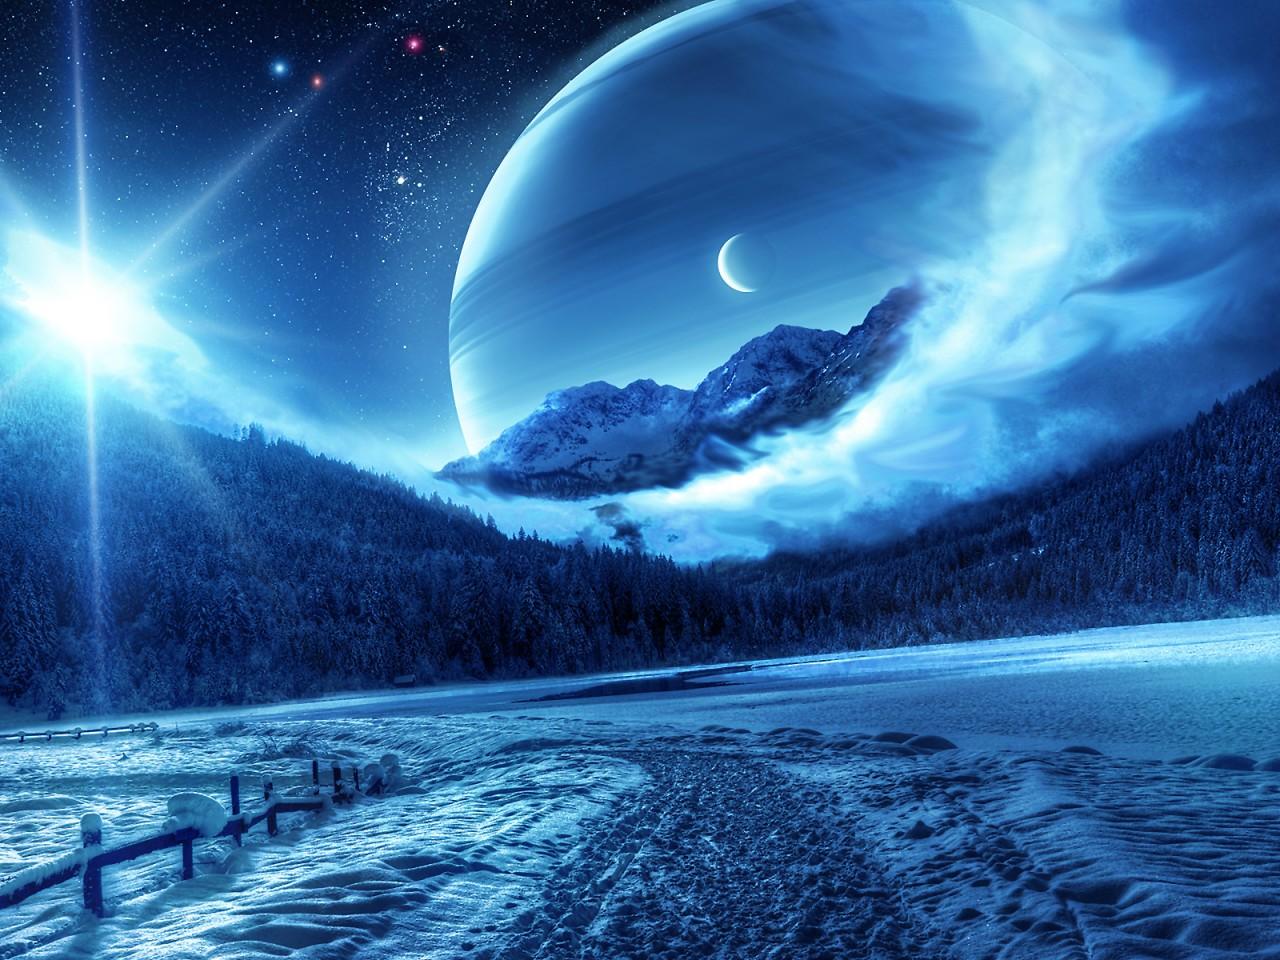 Falling Water Wallpaper 1080p Blue Snowcapped Serenity Wallpaper Hd Wallpapers